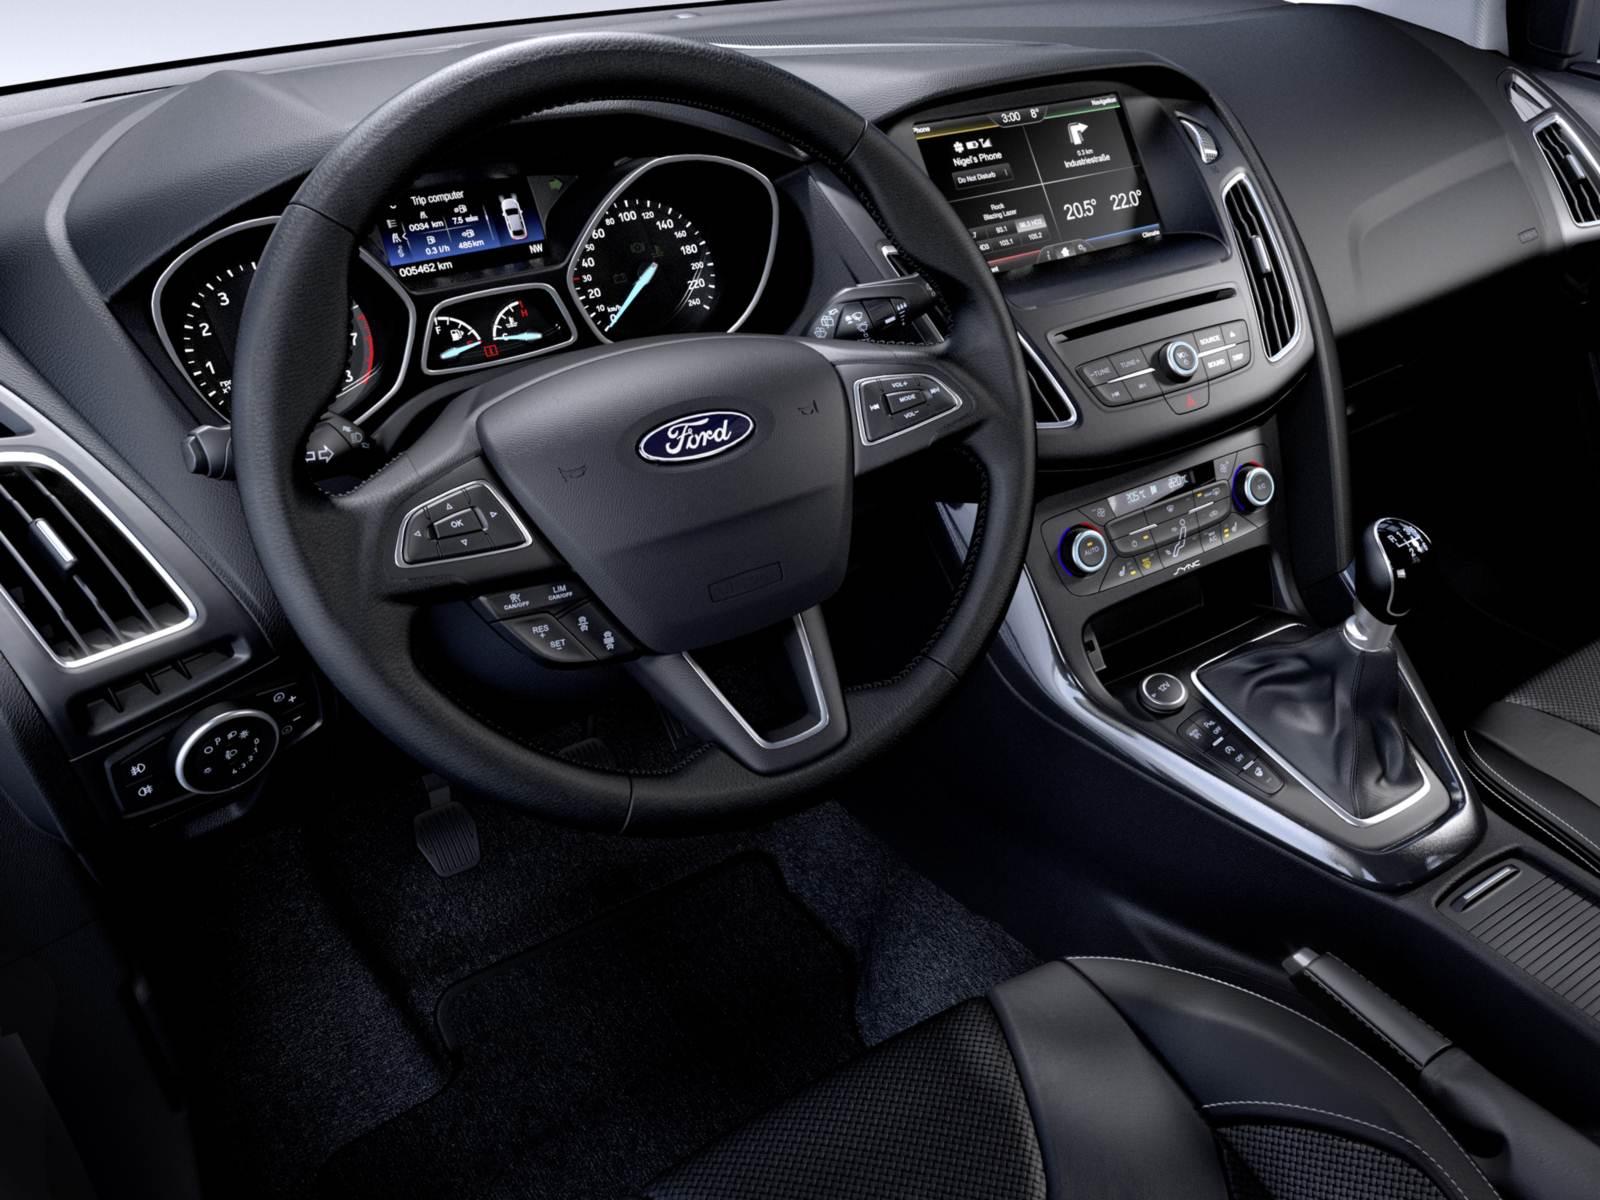 Novo Ford Focus 2015 - interior